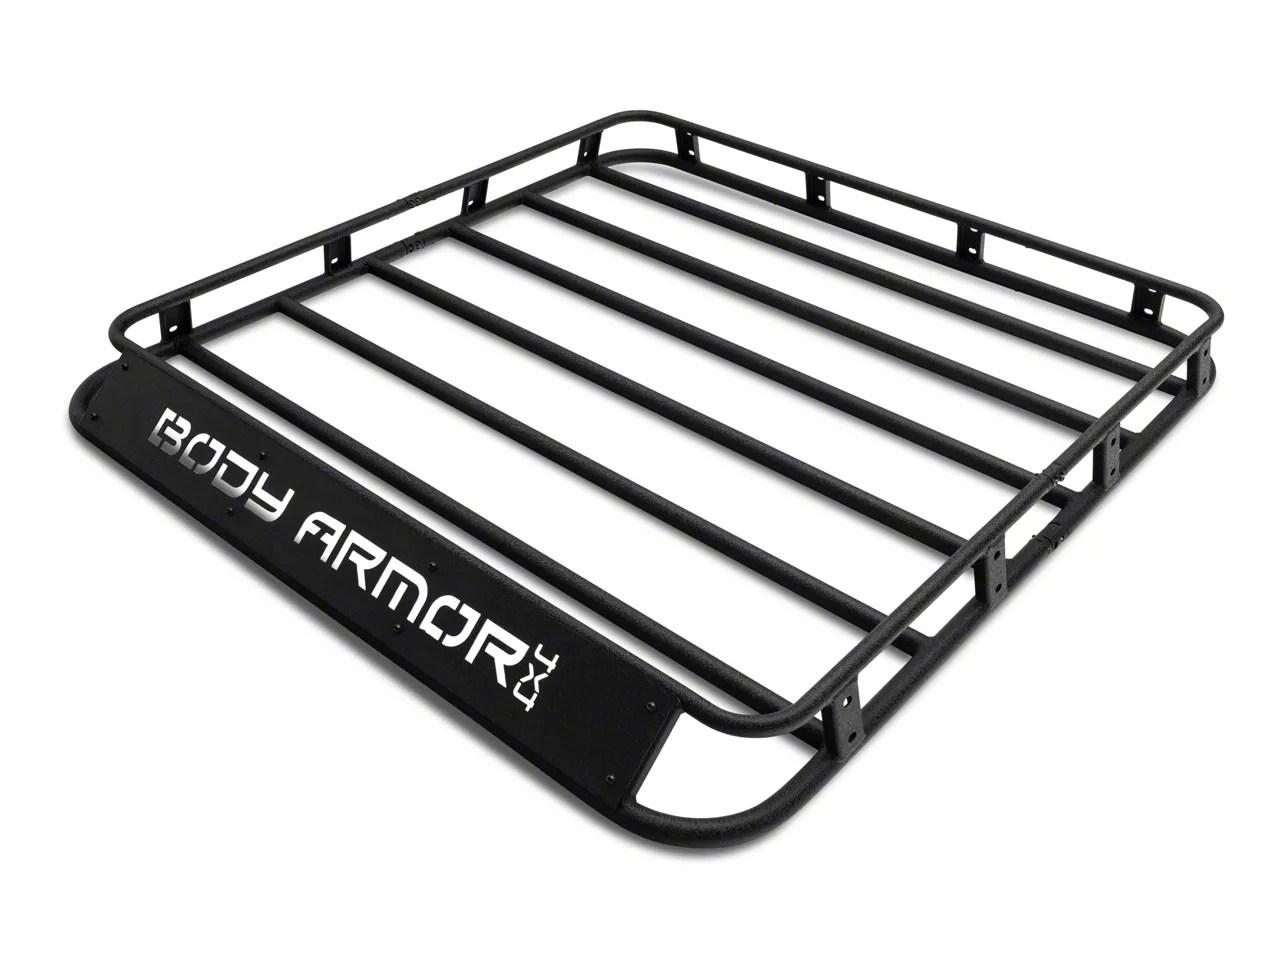 body armor 4x4 overland style roof rack basket 07 18 jeep wrangler jk